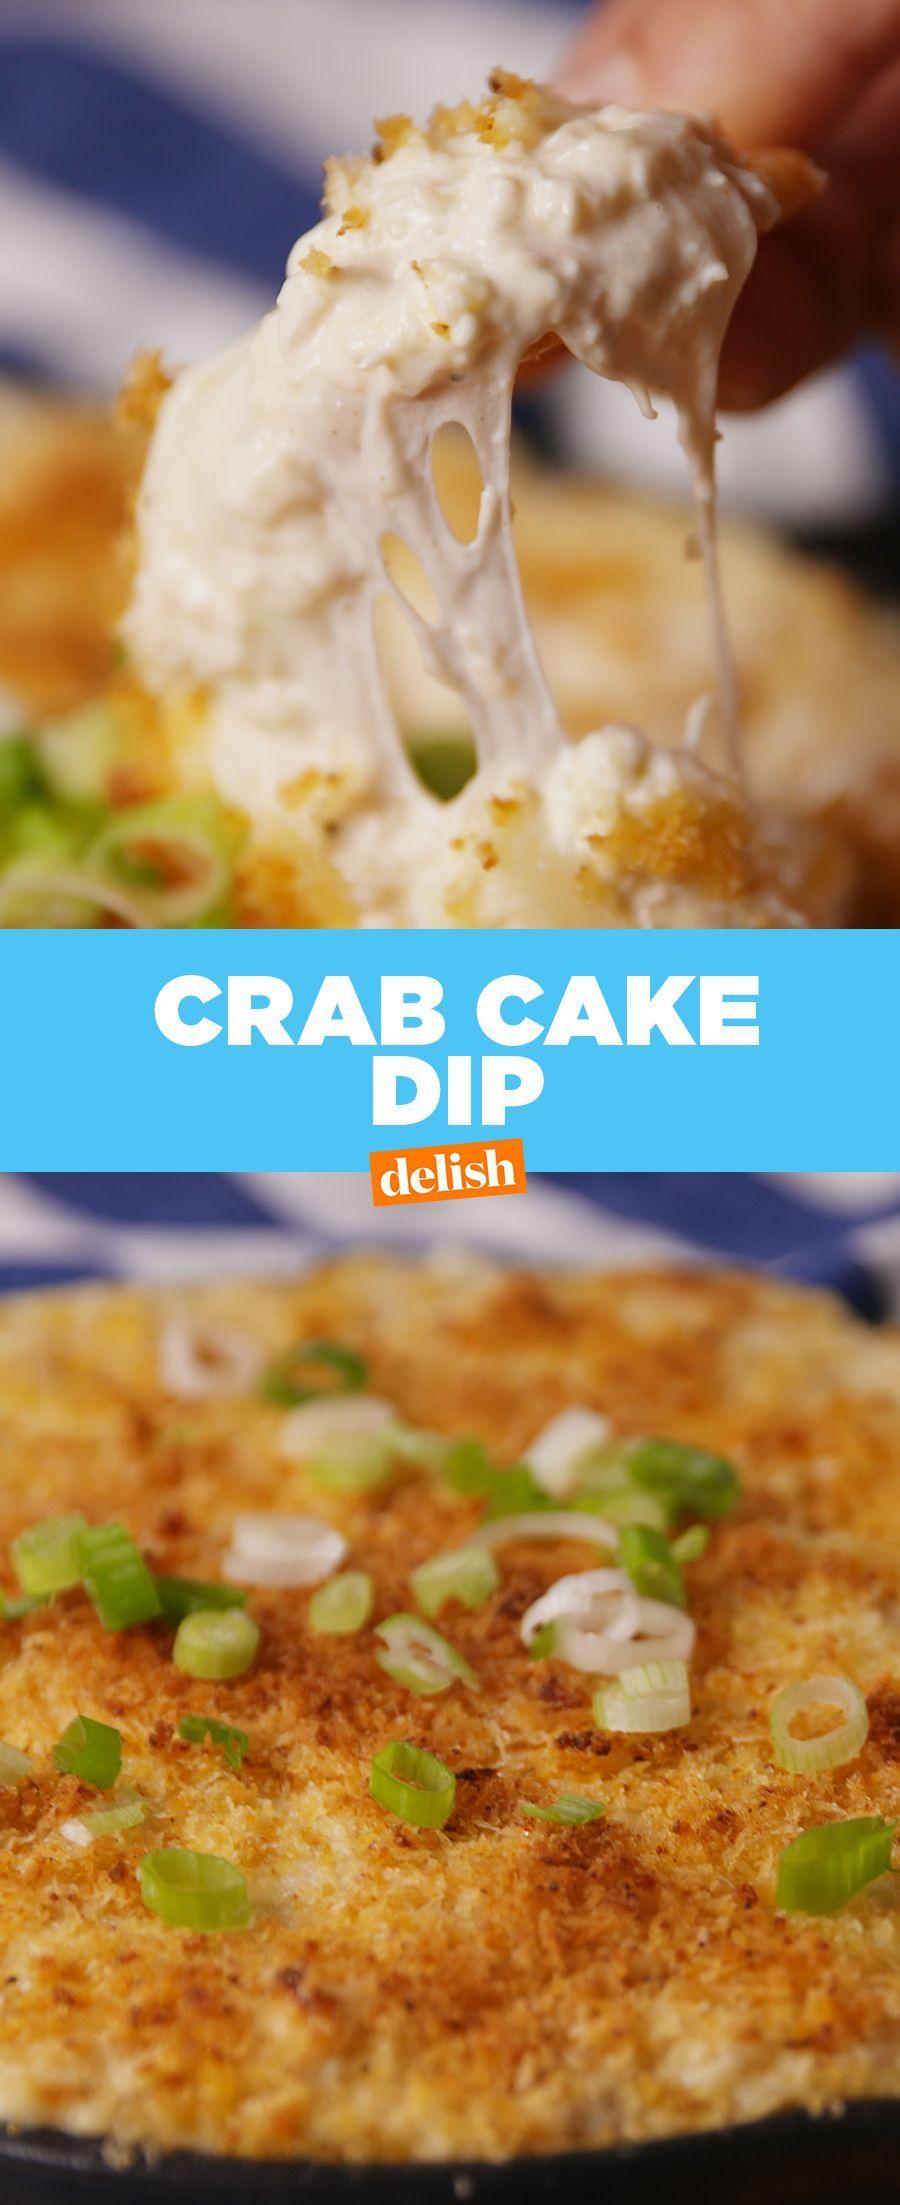 Crab cake dip recipe in 2020 crab cake dip cake dip